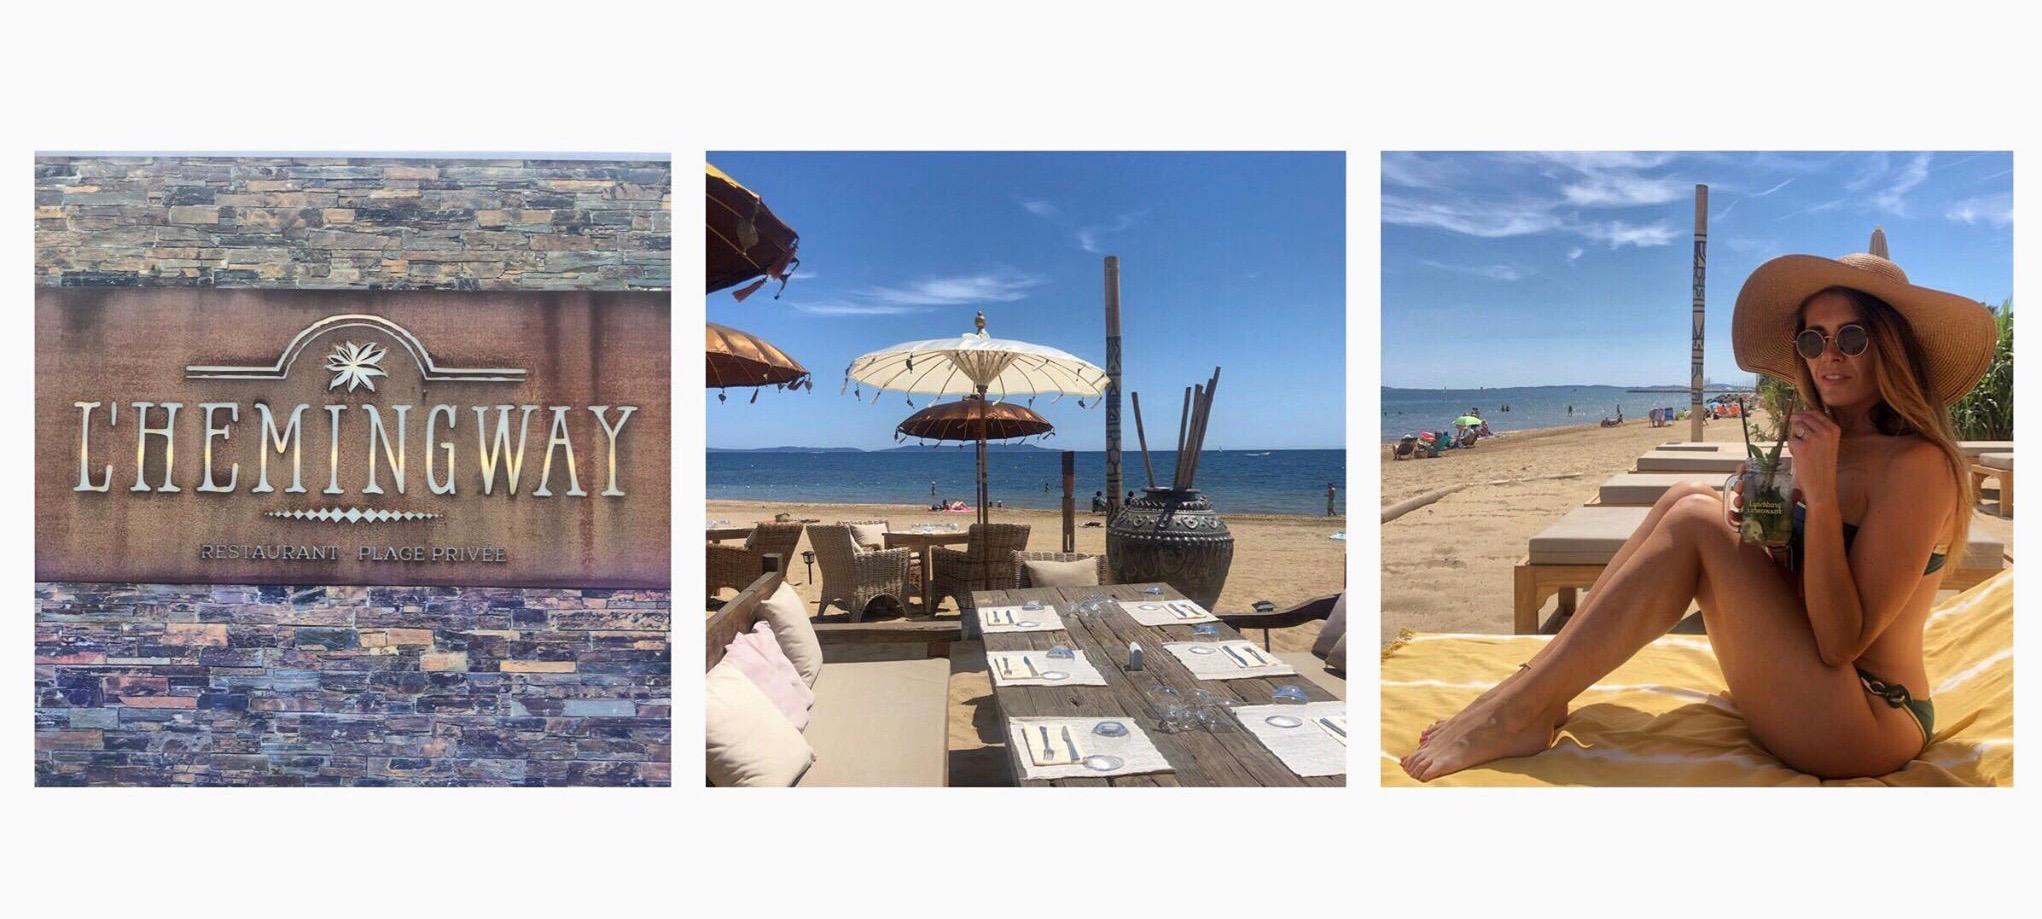 restaurant l'Hemingway plage privée var